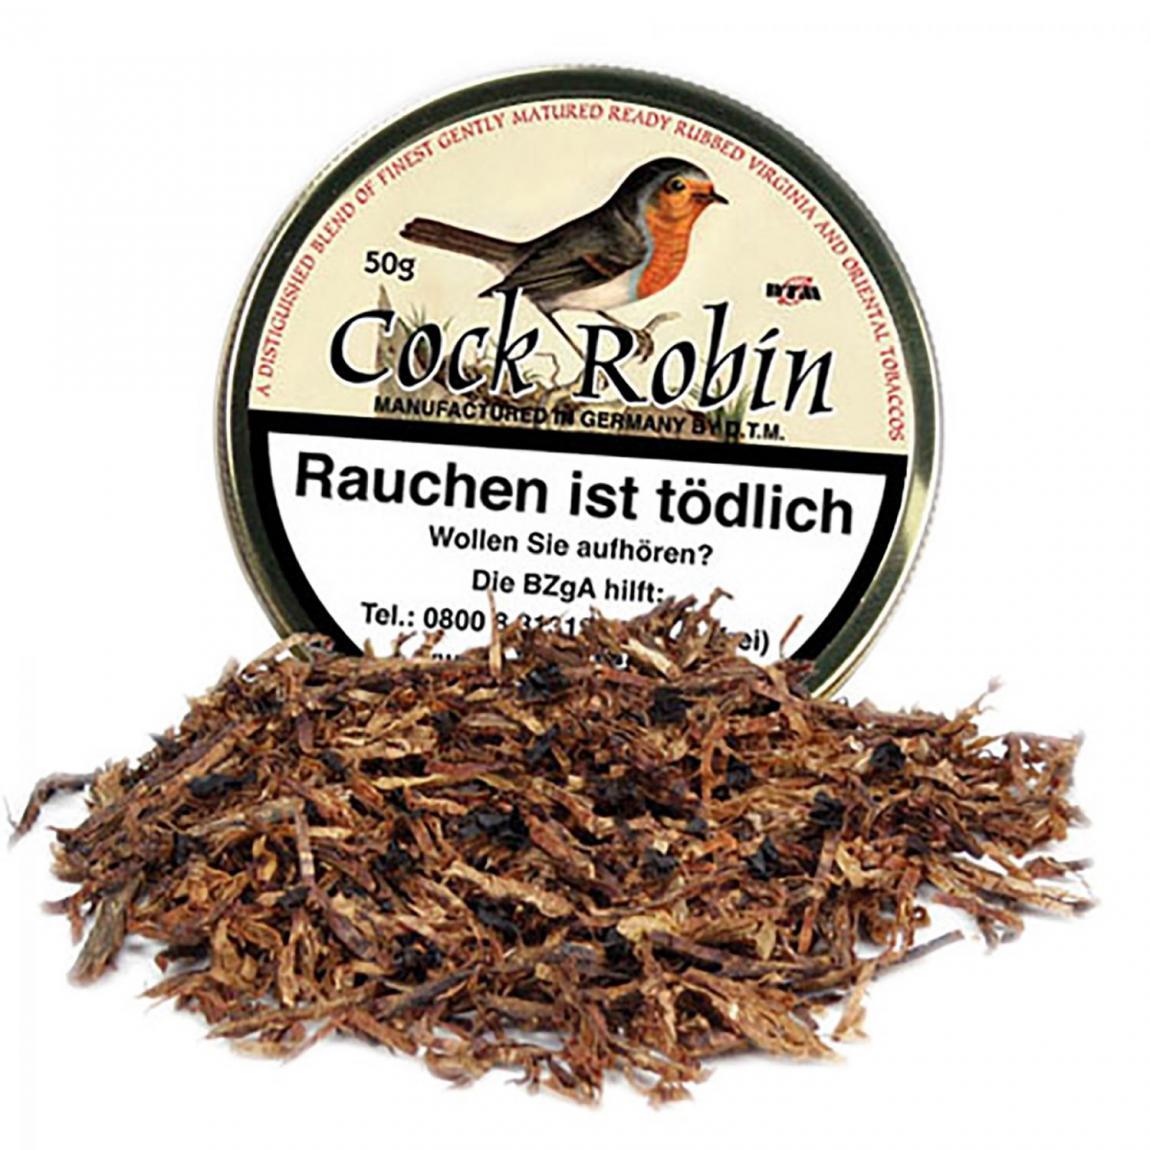 Cock Robin, Ready Rubbed 50g Dose